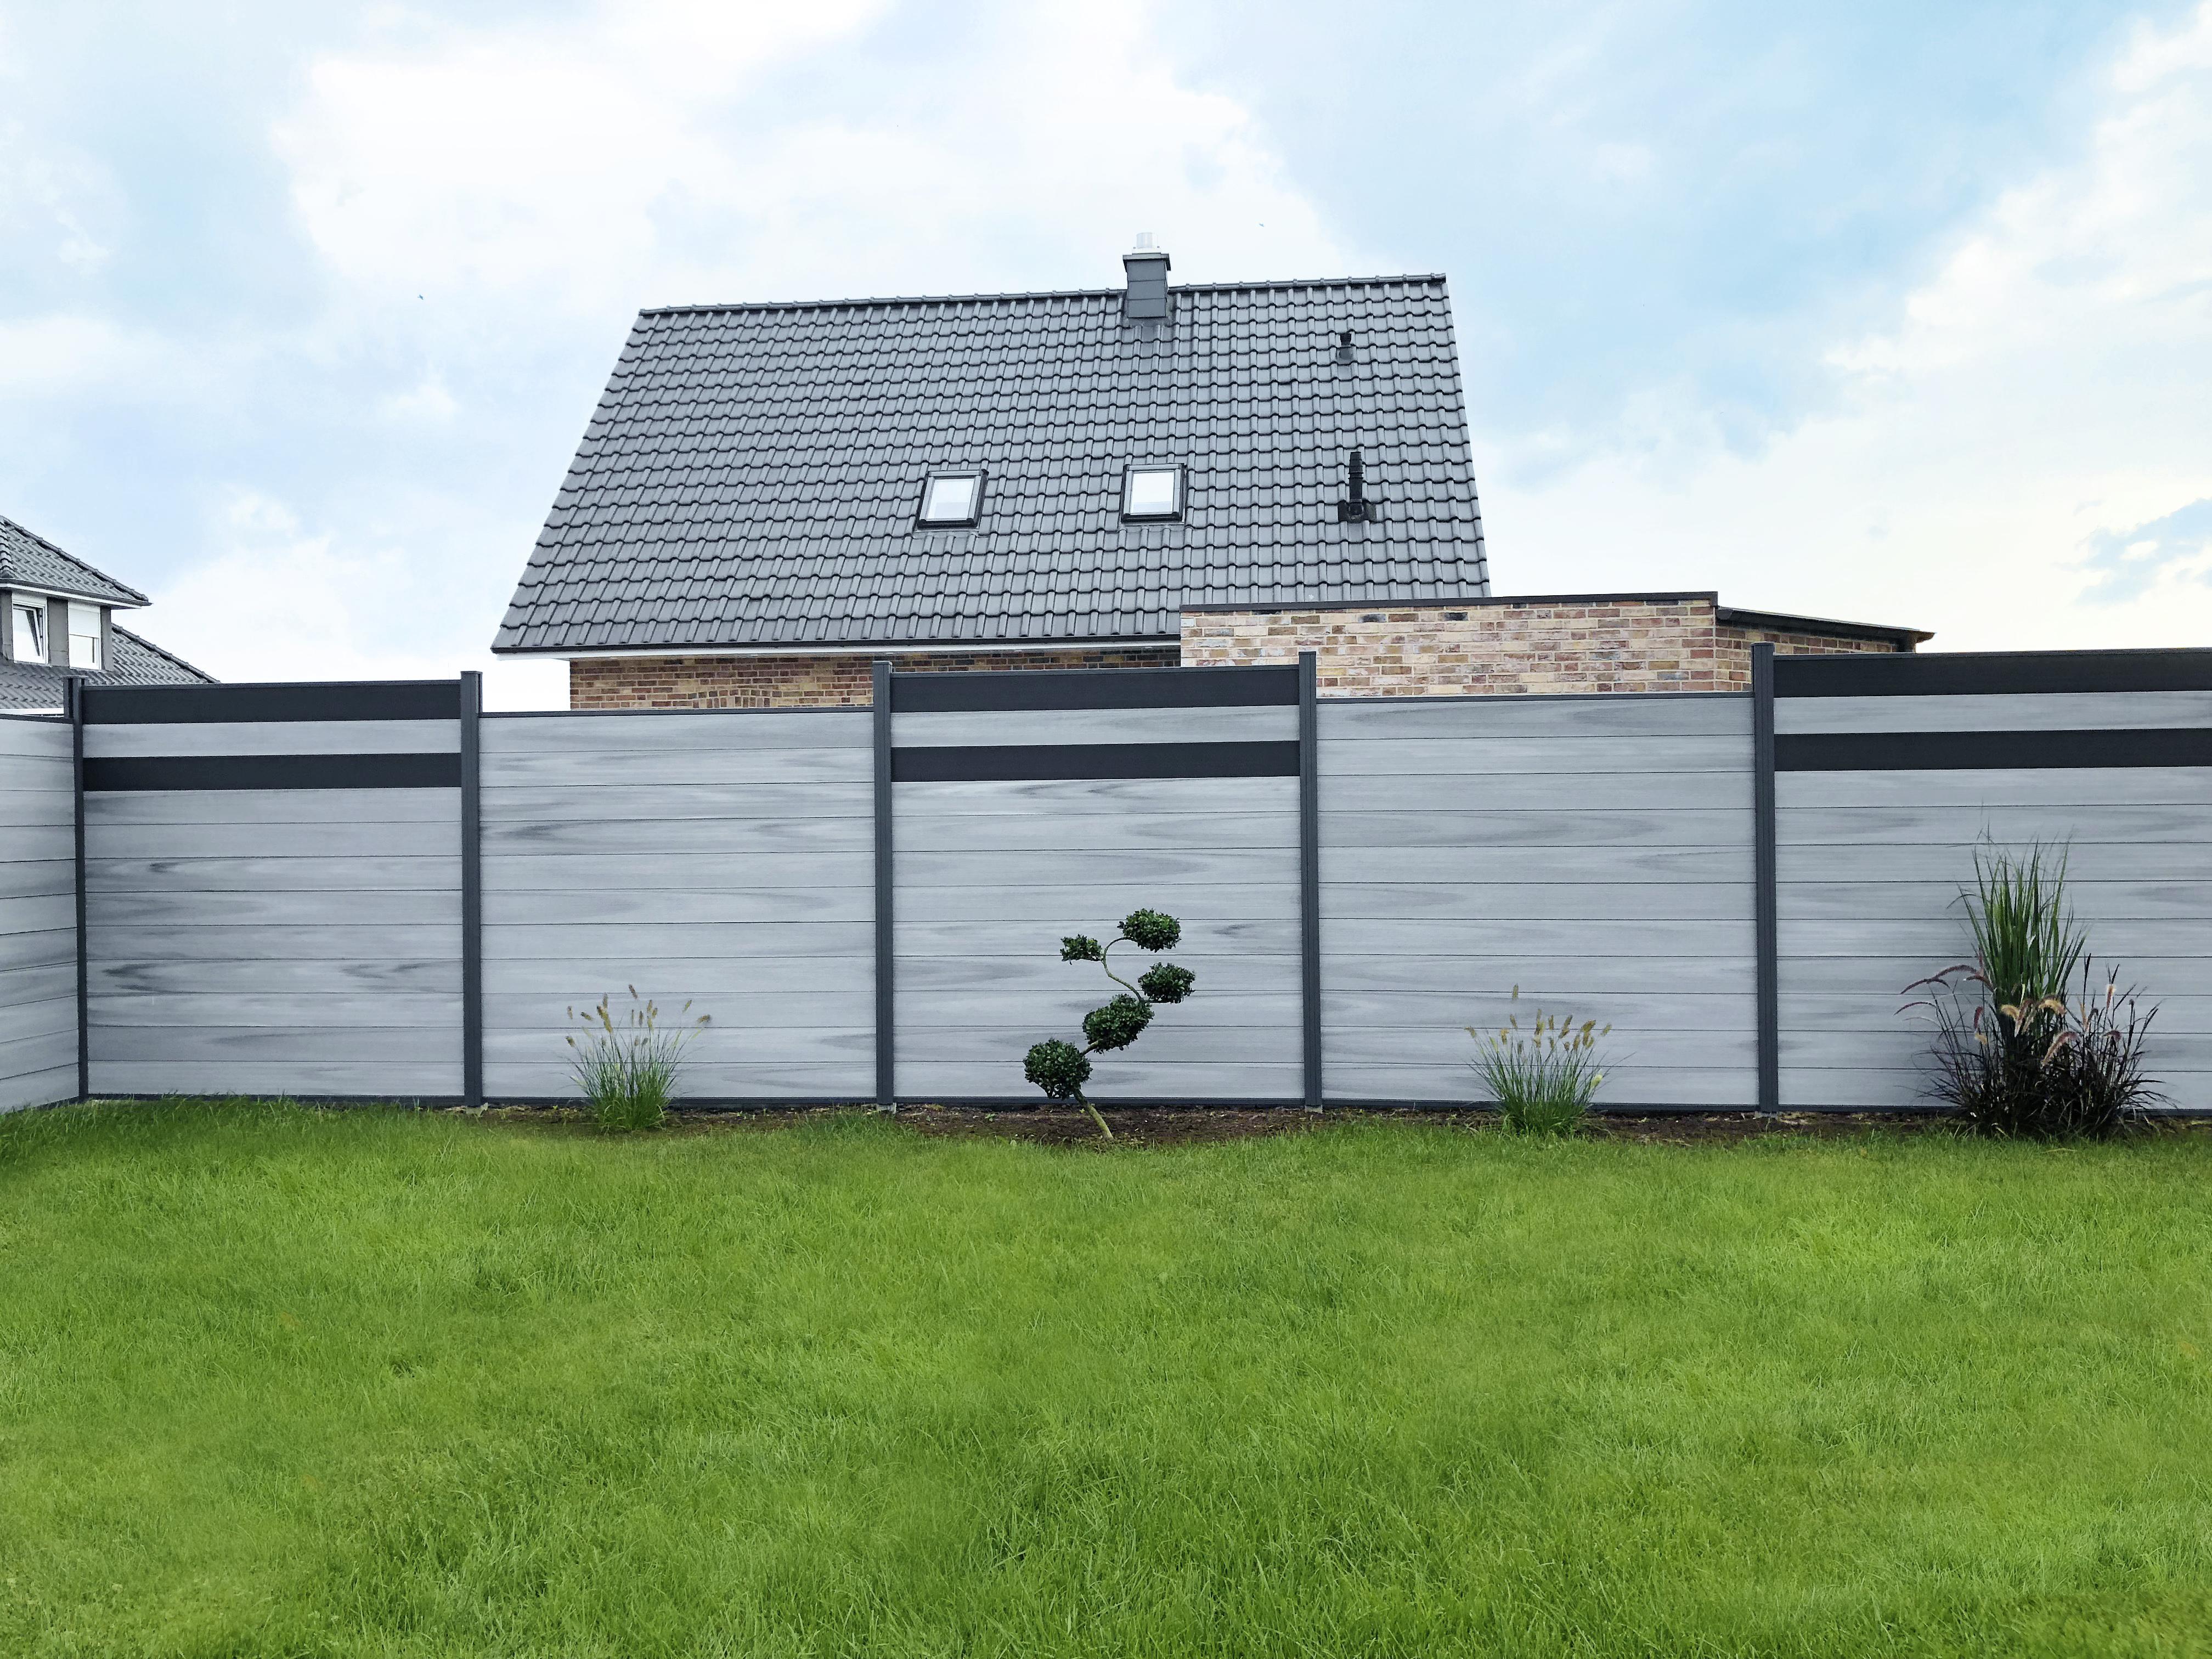 Tomi Wpc Premium Line Musterpaket Sichtschutzzaun Zaun Gartenzaun Grau